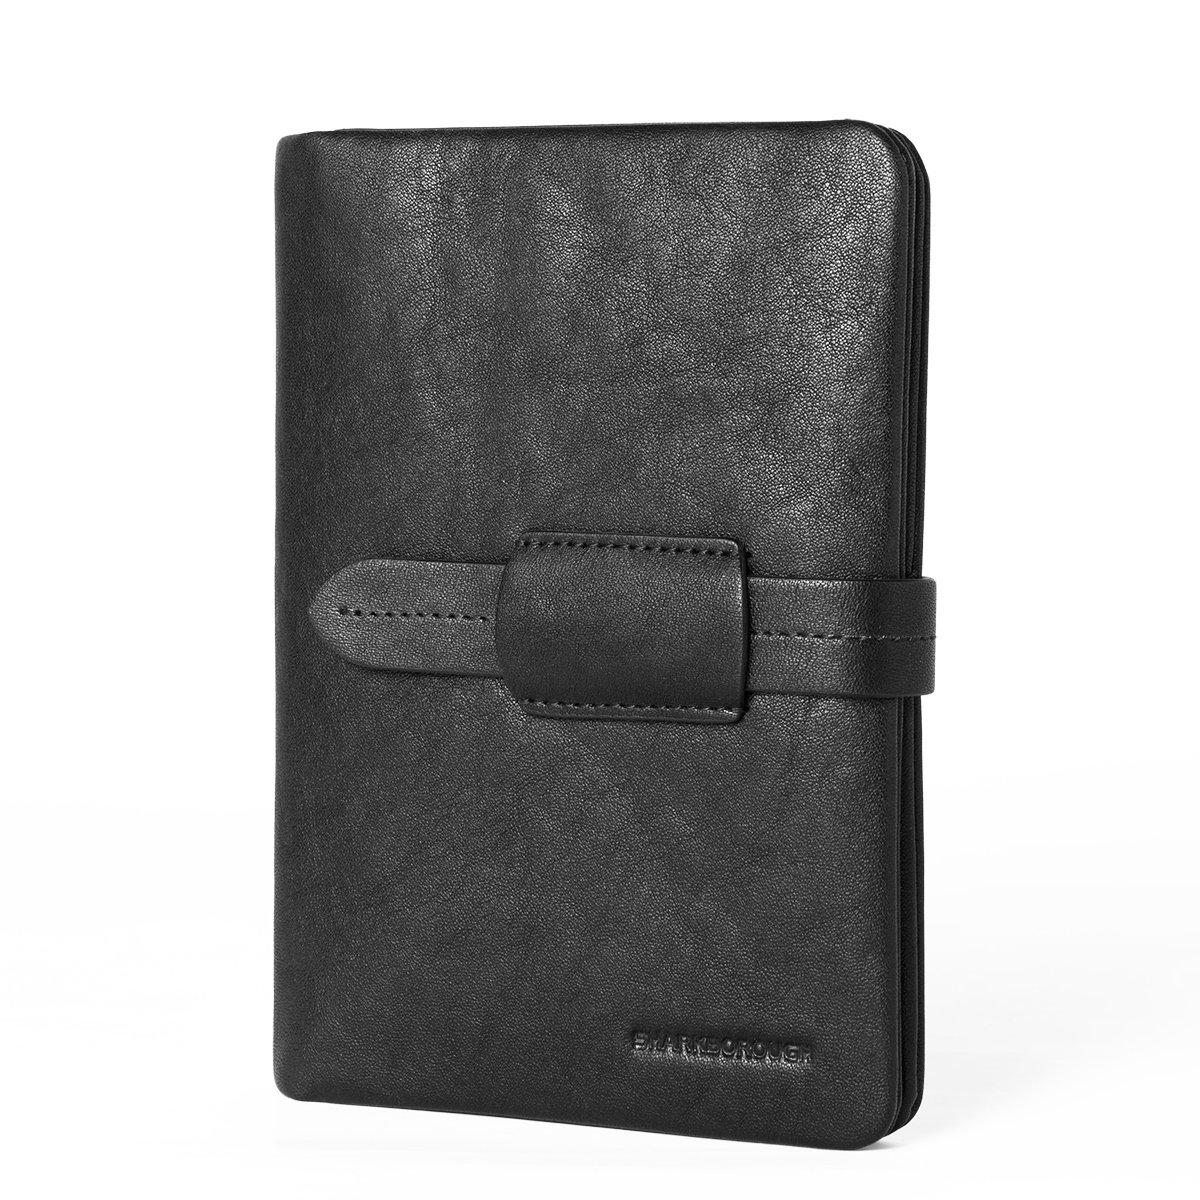 Sharkborough Damier Classique Leather Passport Holder Bifold Travel Wallet For Men And Women Cover Slim Id Card Case